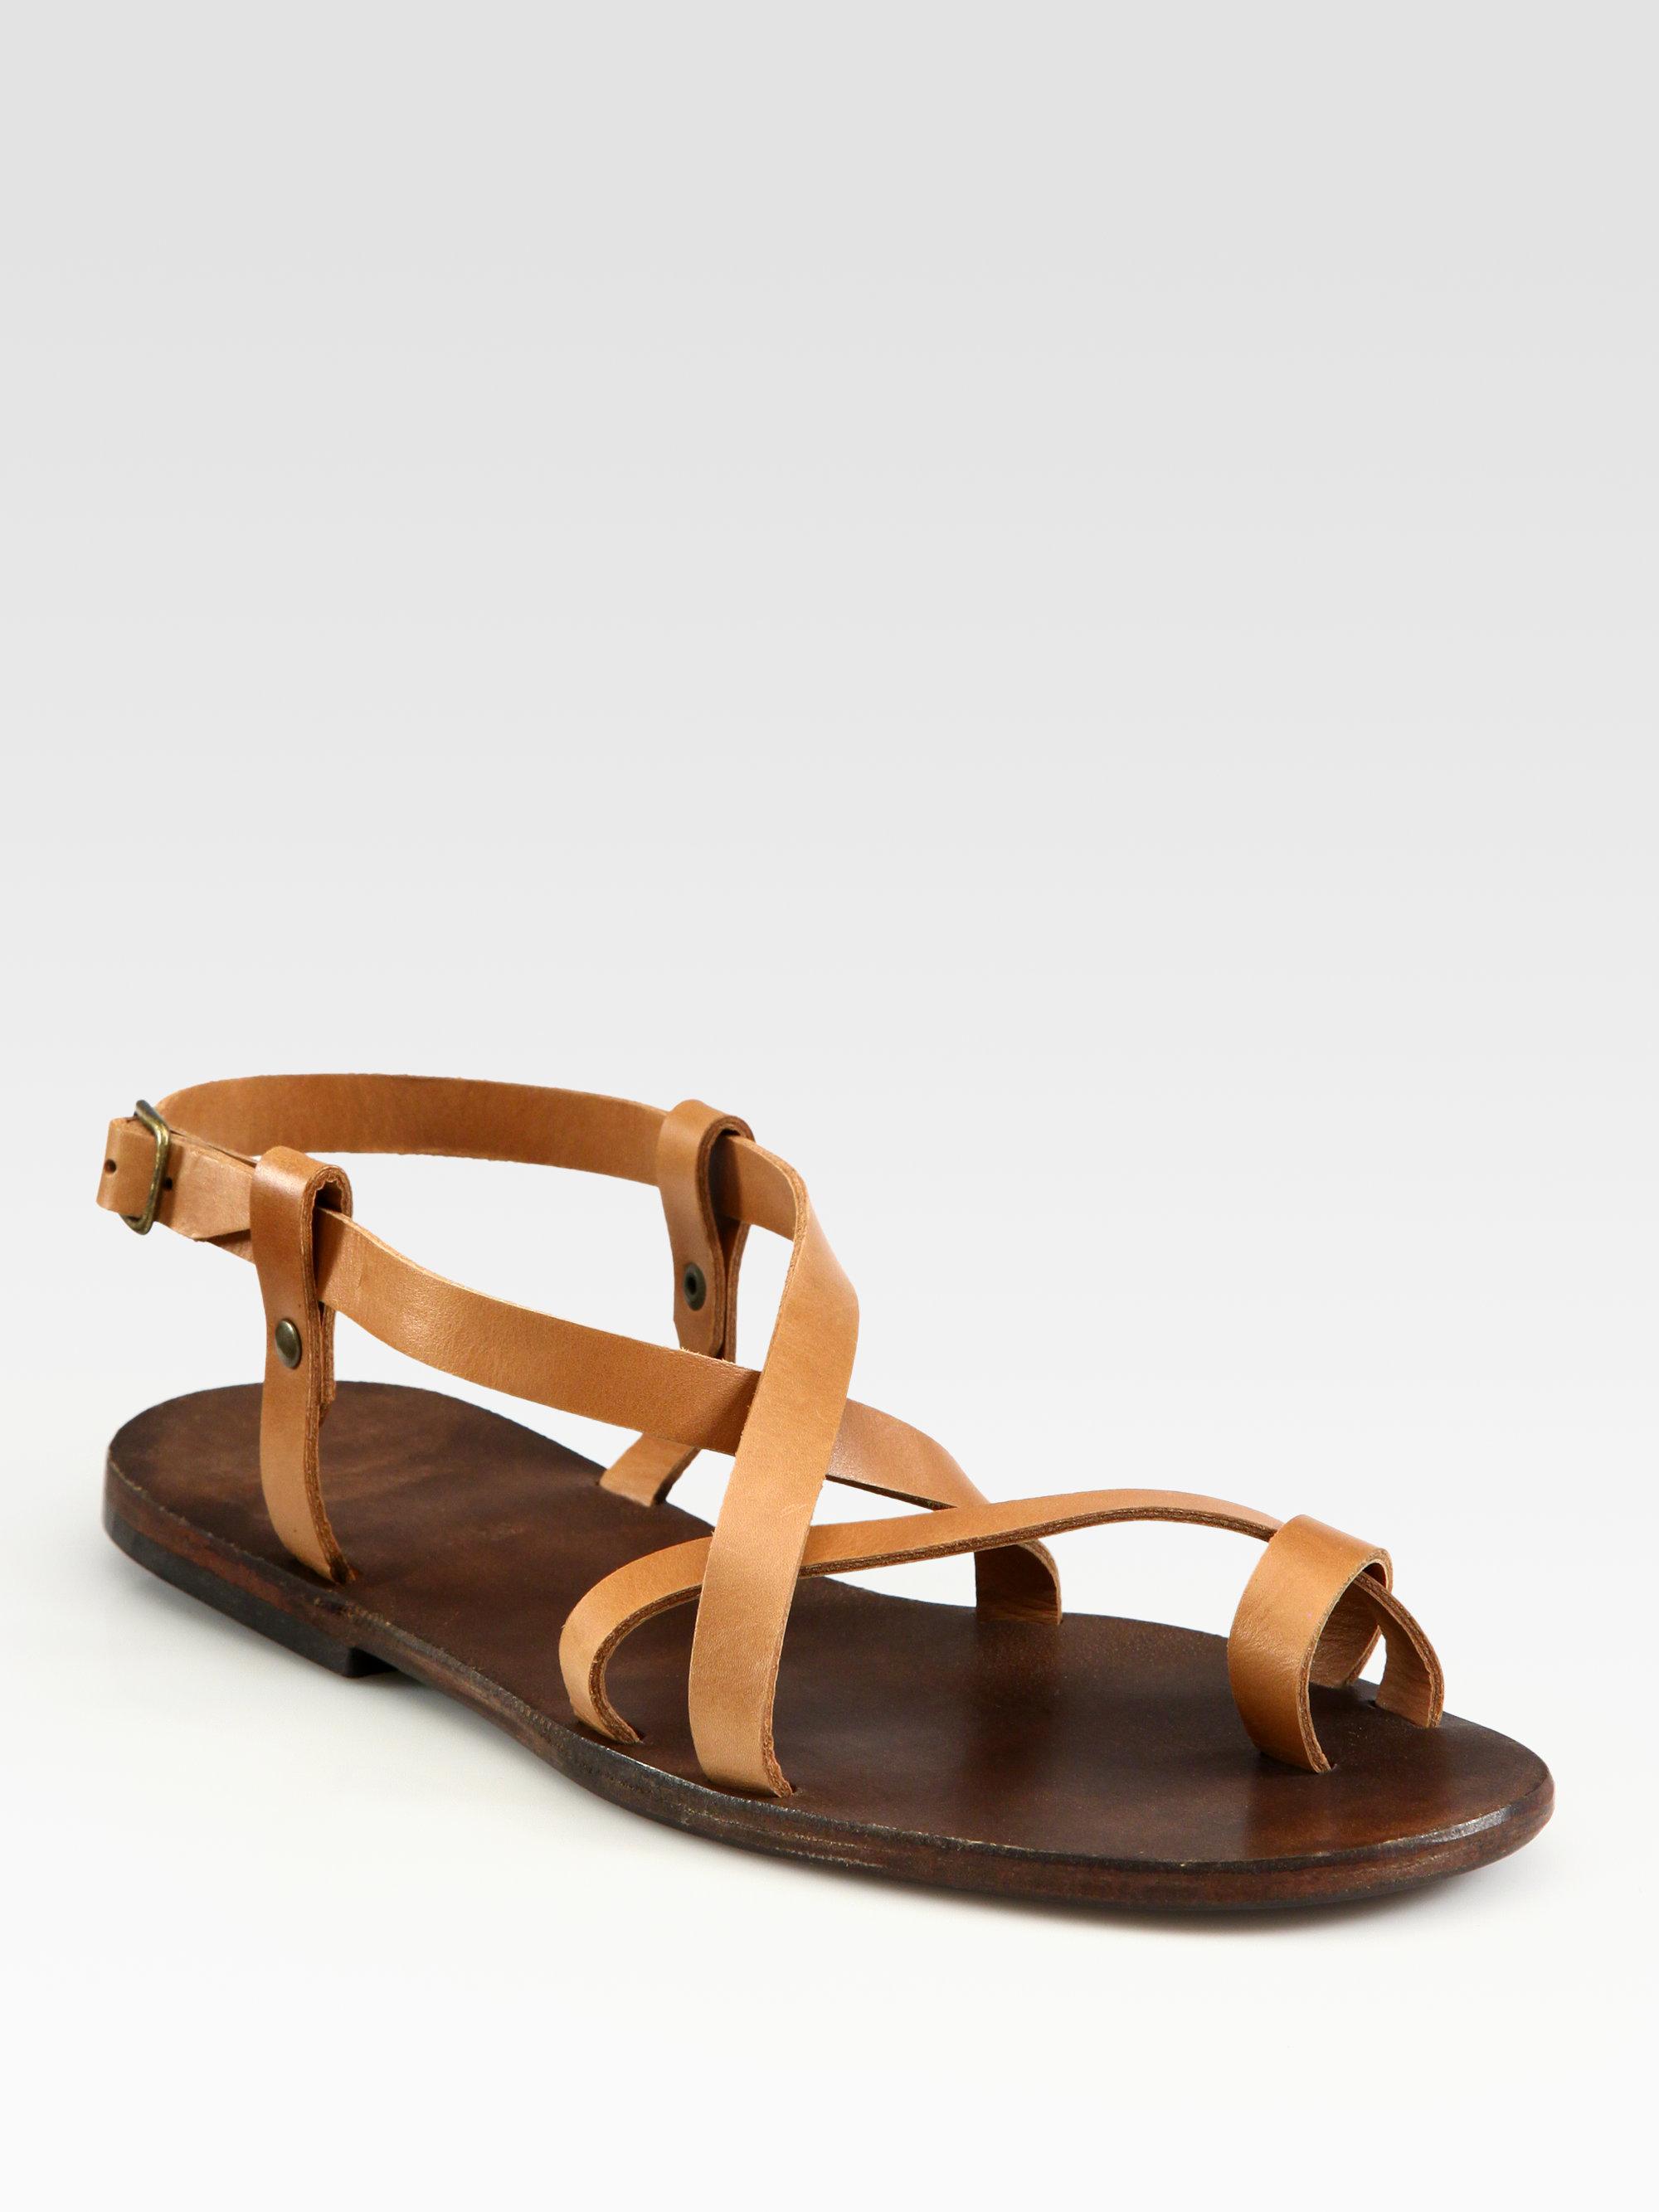 ceb7dc5b4 Ishvara Ibiza Leather Crisscross Sandals in Brown - Lyst